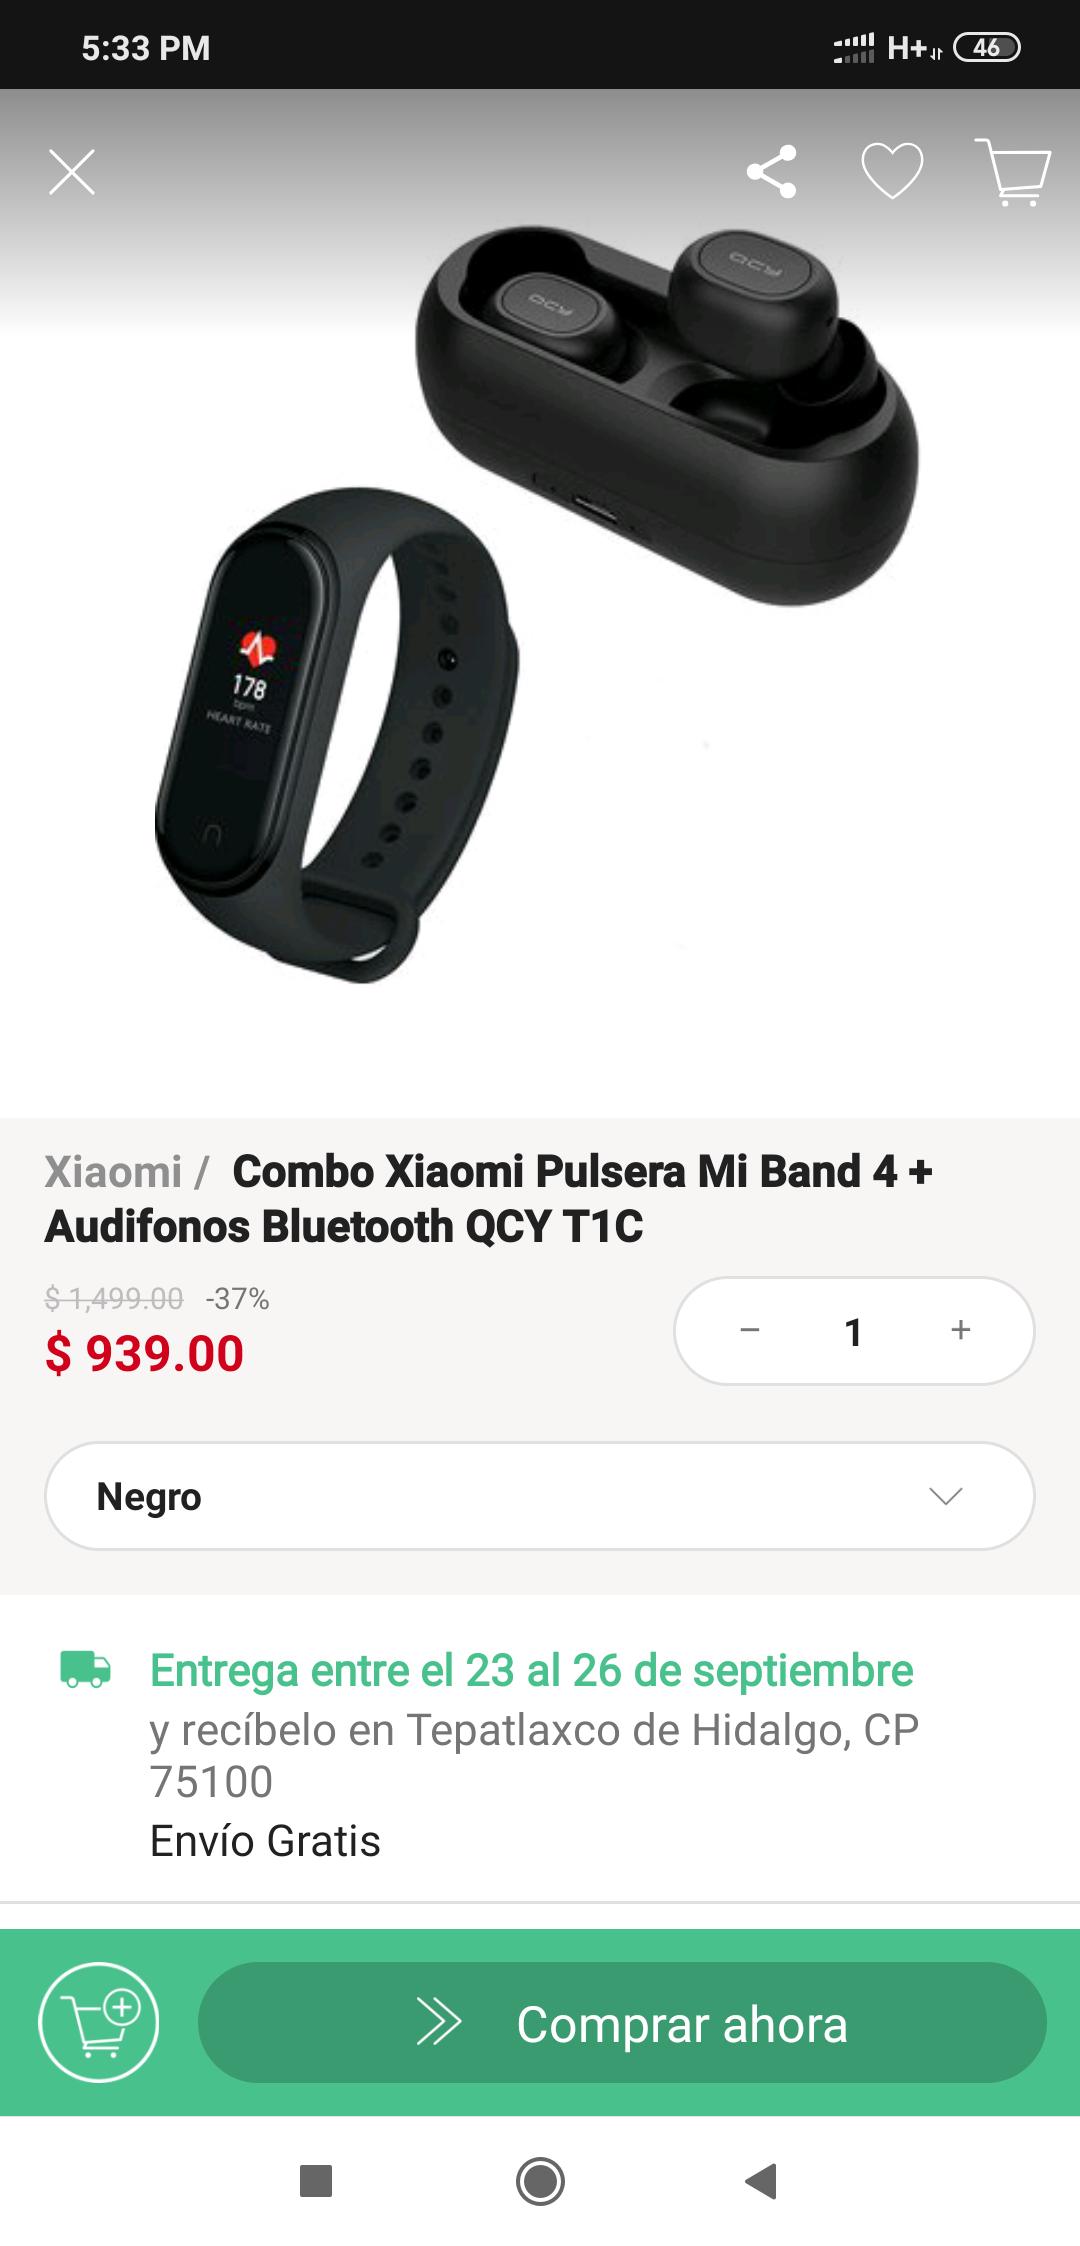 Linio: Combo Xiaomi Pulsera Mi Band 4 + Audifonos Bluetooth QCY T1C